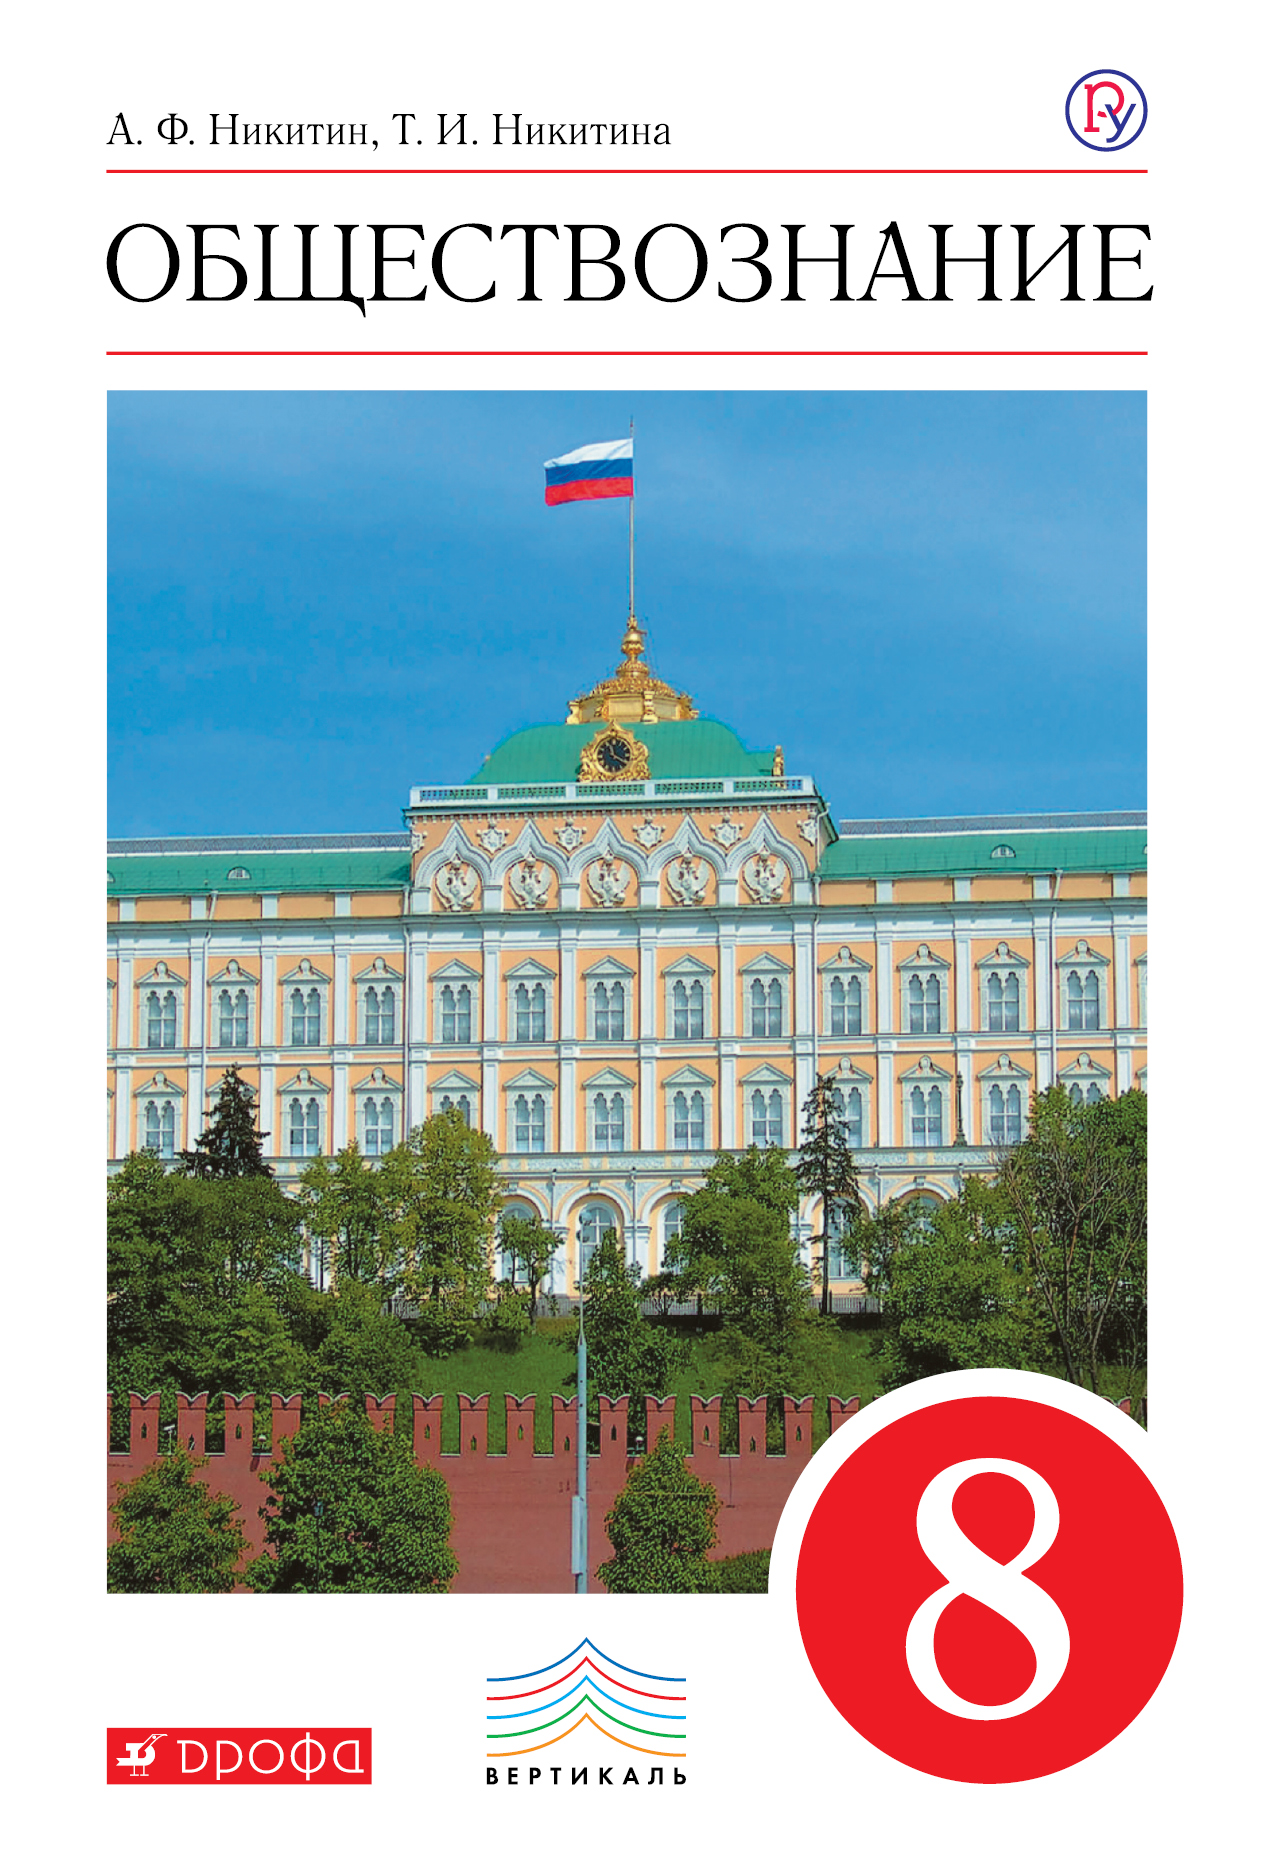 А. Ф. Никитин, Т. И. Никитина Обществознание. 8 класс. Учебник